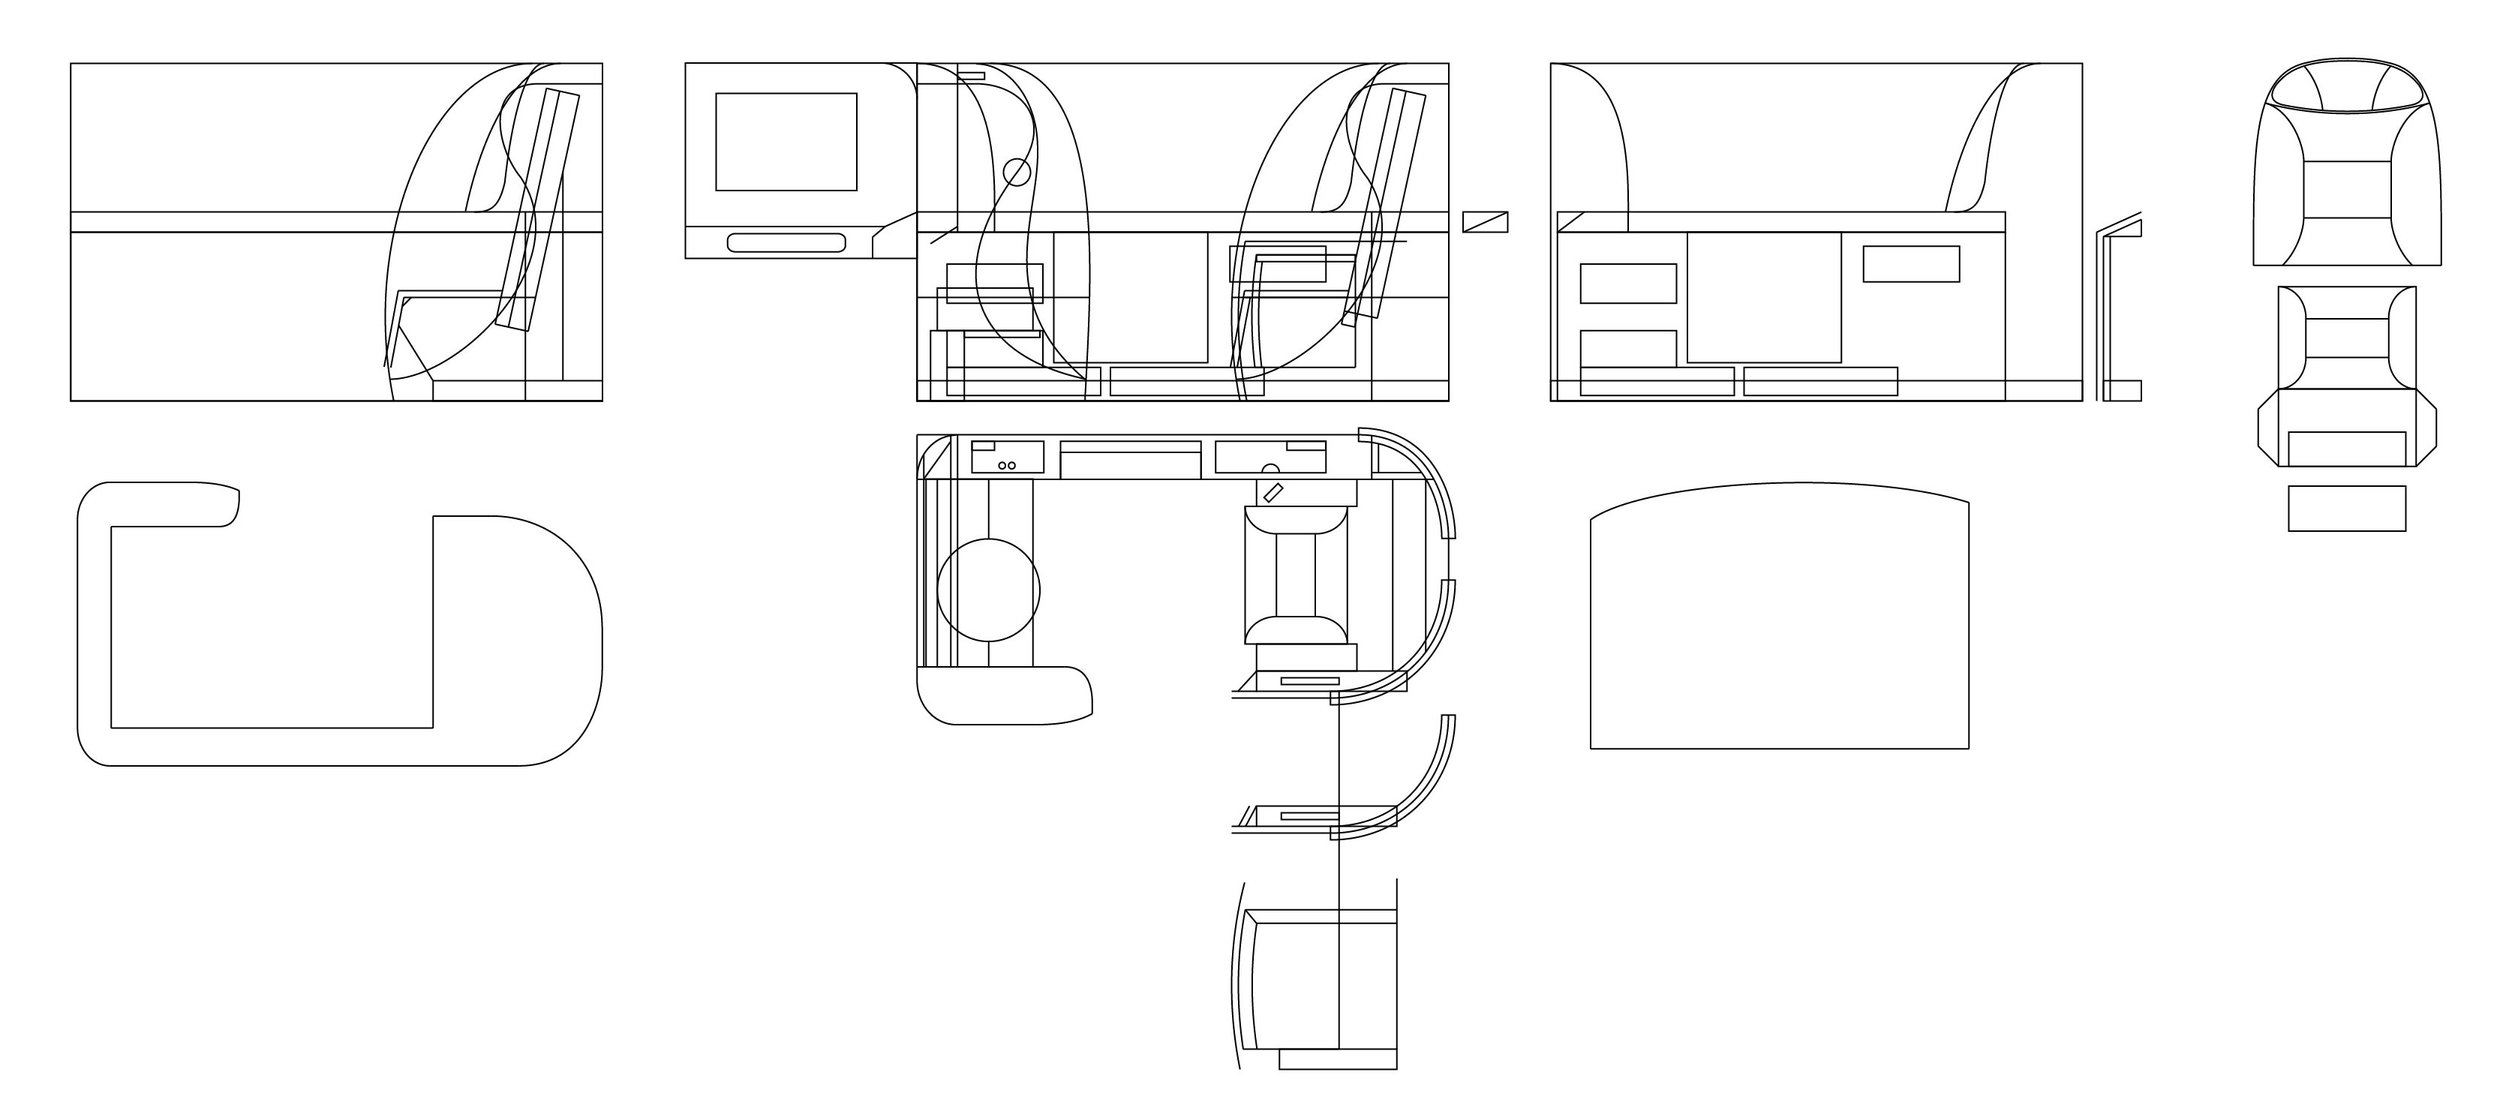 Cabin - first - drawings 2.jpg